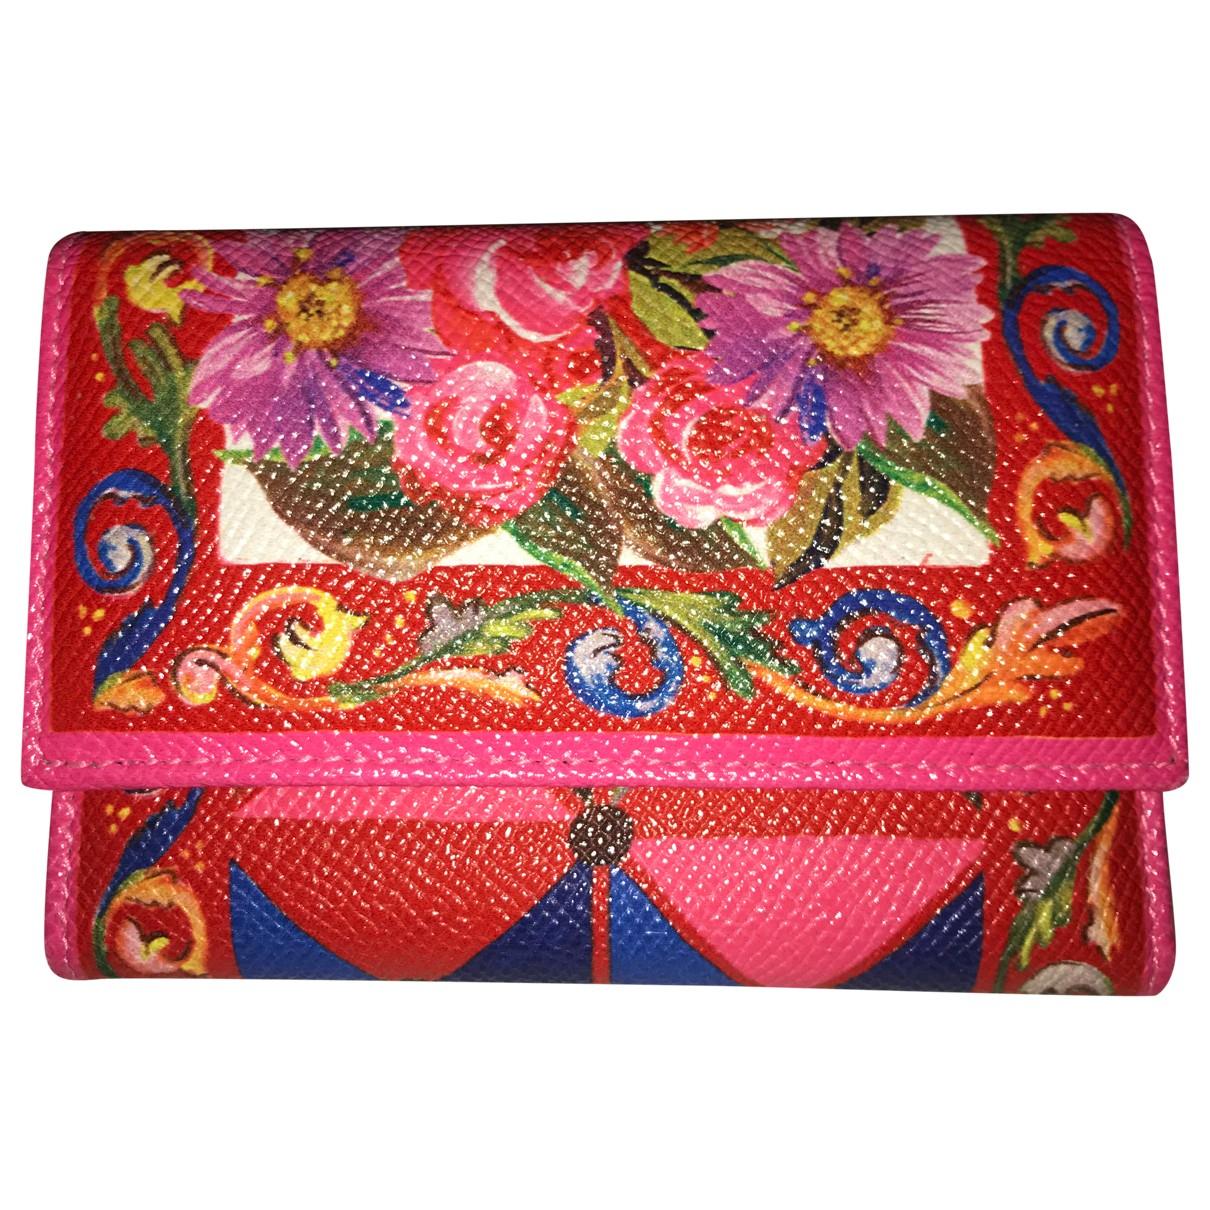 Dolce & Gabbana N Multicolour Leather wallet for Women N